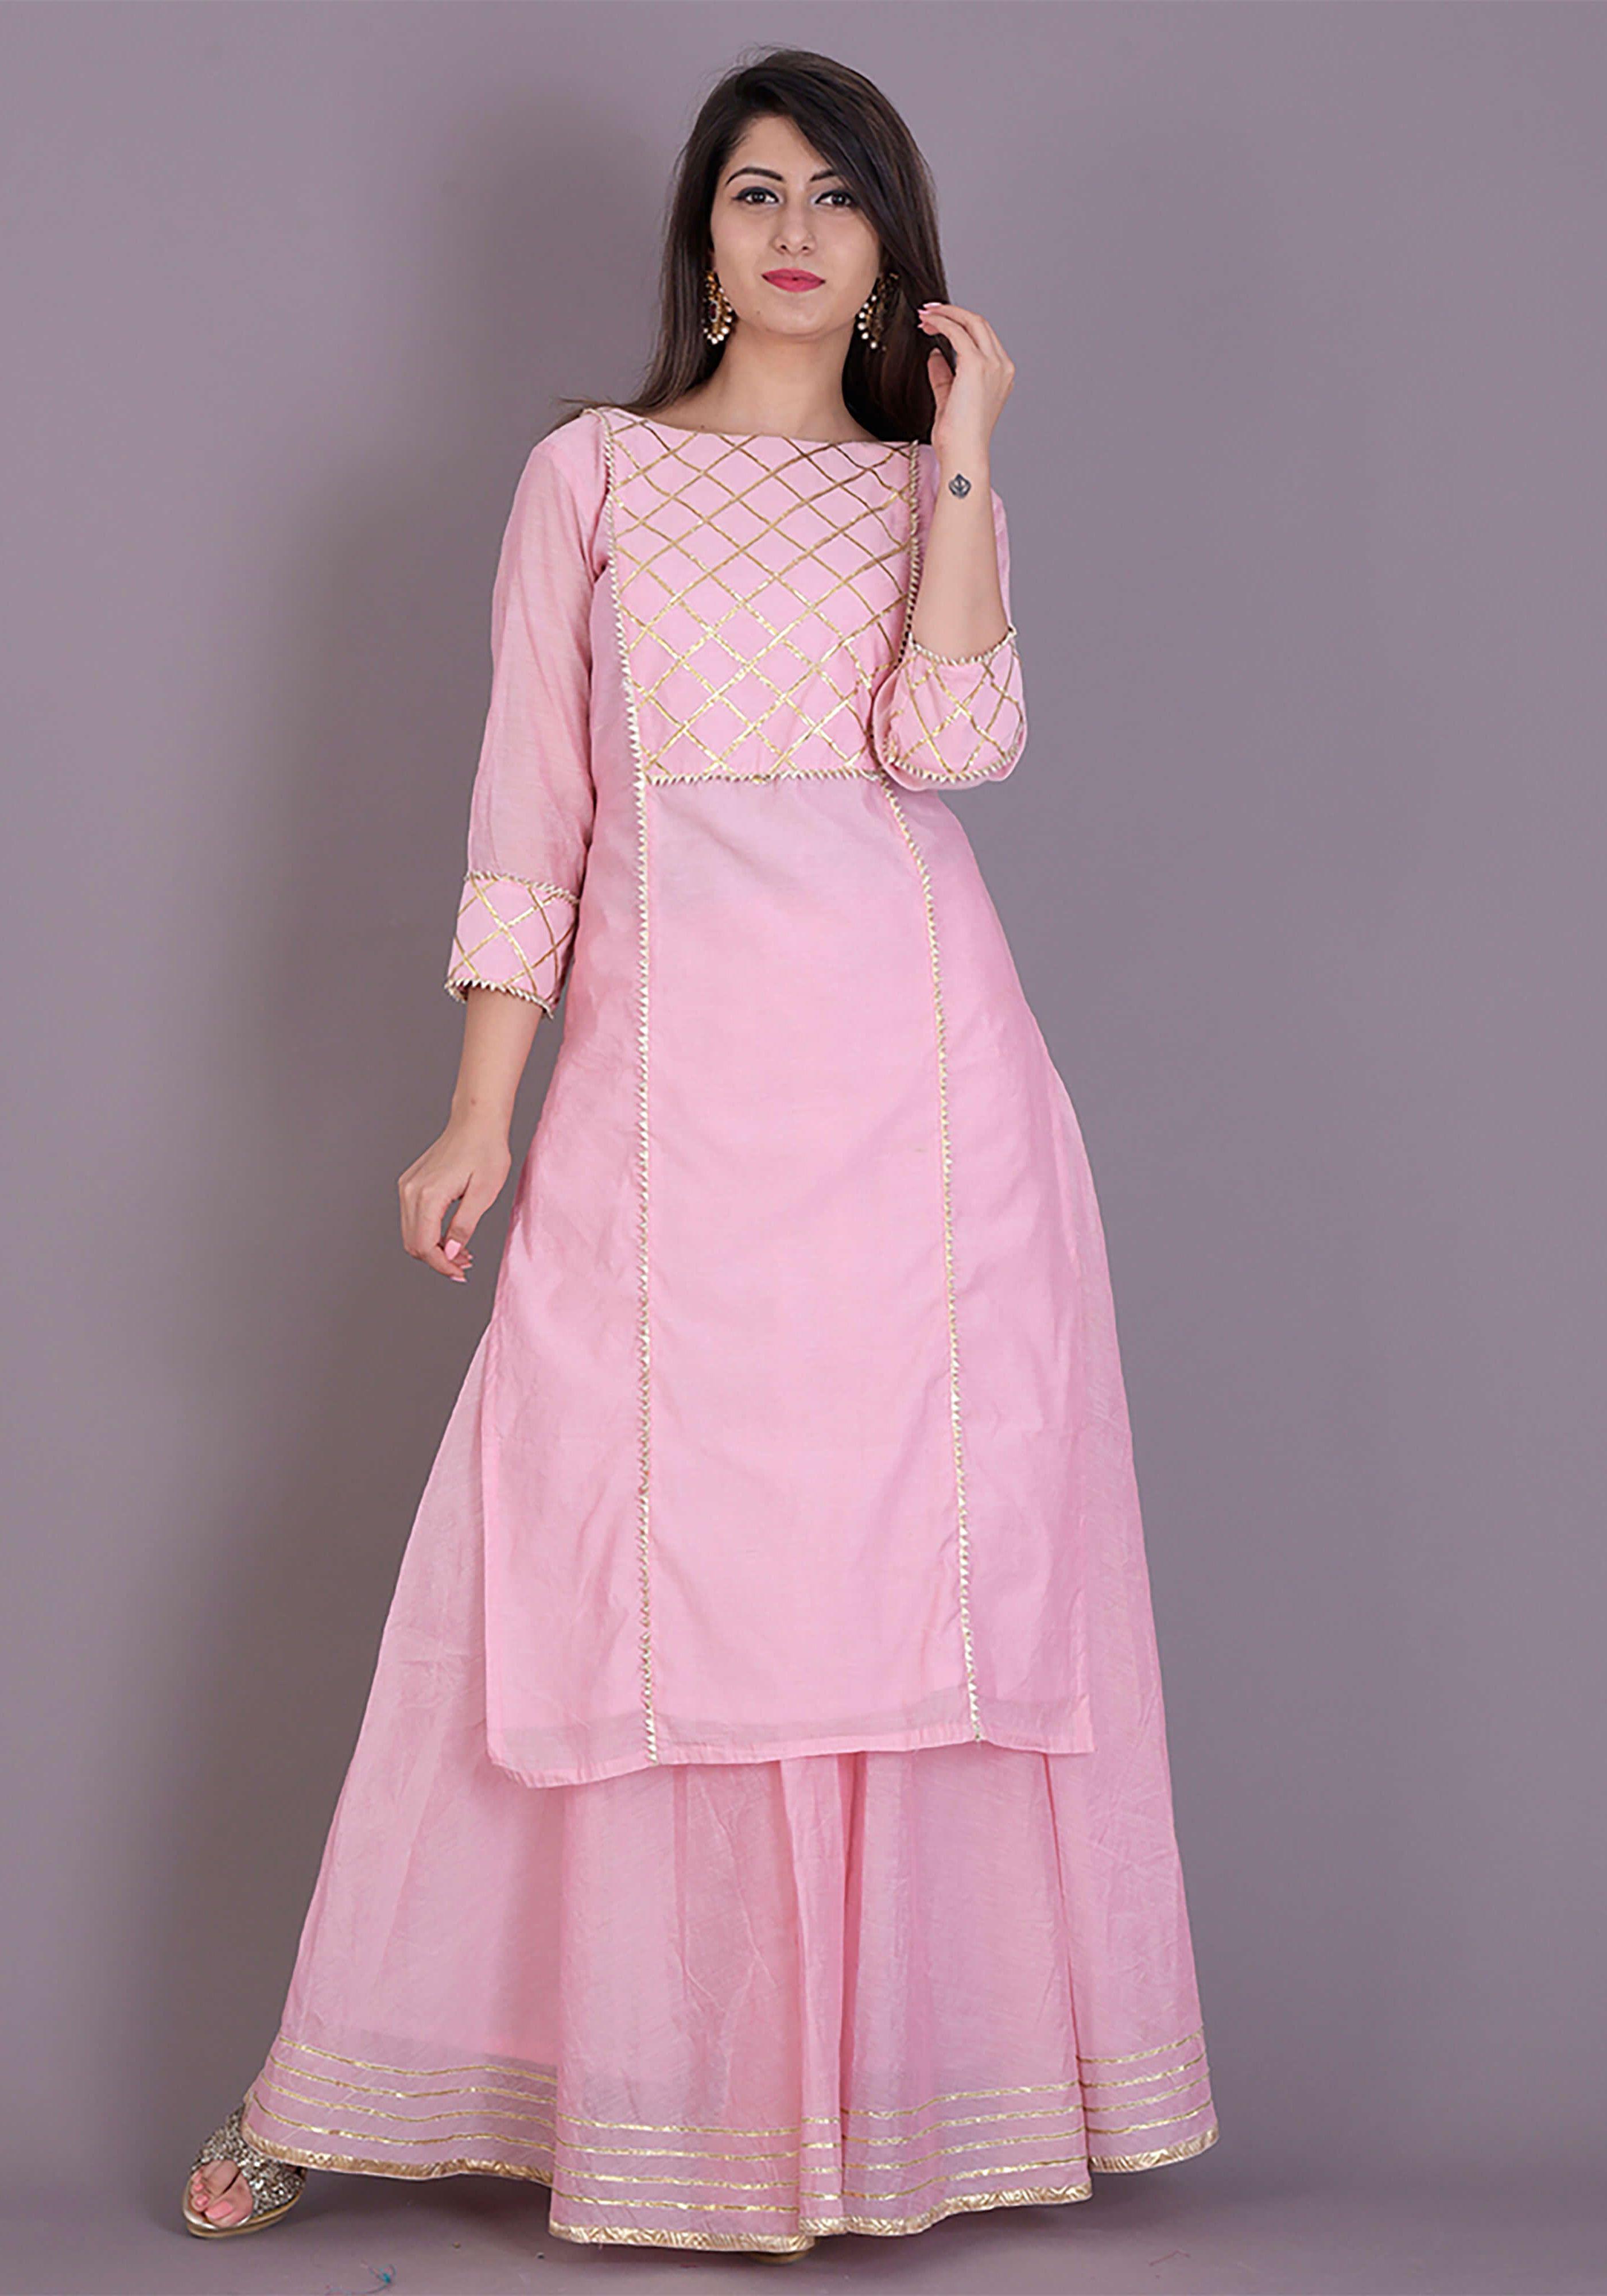 d5e1aad61a1 Baby pink kurta skirt set emblisshed with gota work.  dresses  festive   weddingdresses  suitset  womenclothing  wedding